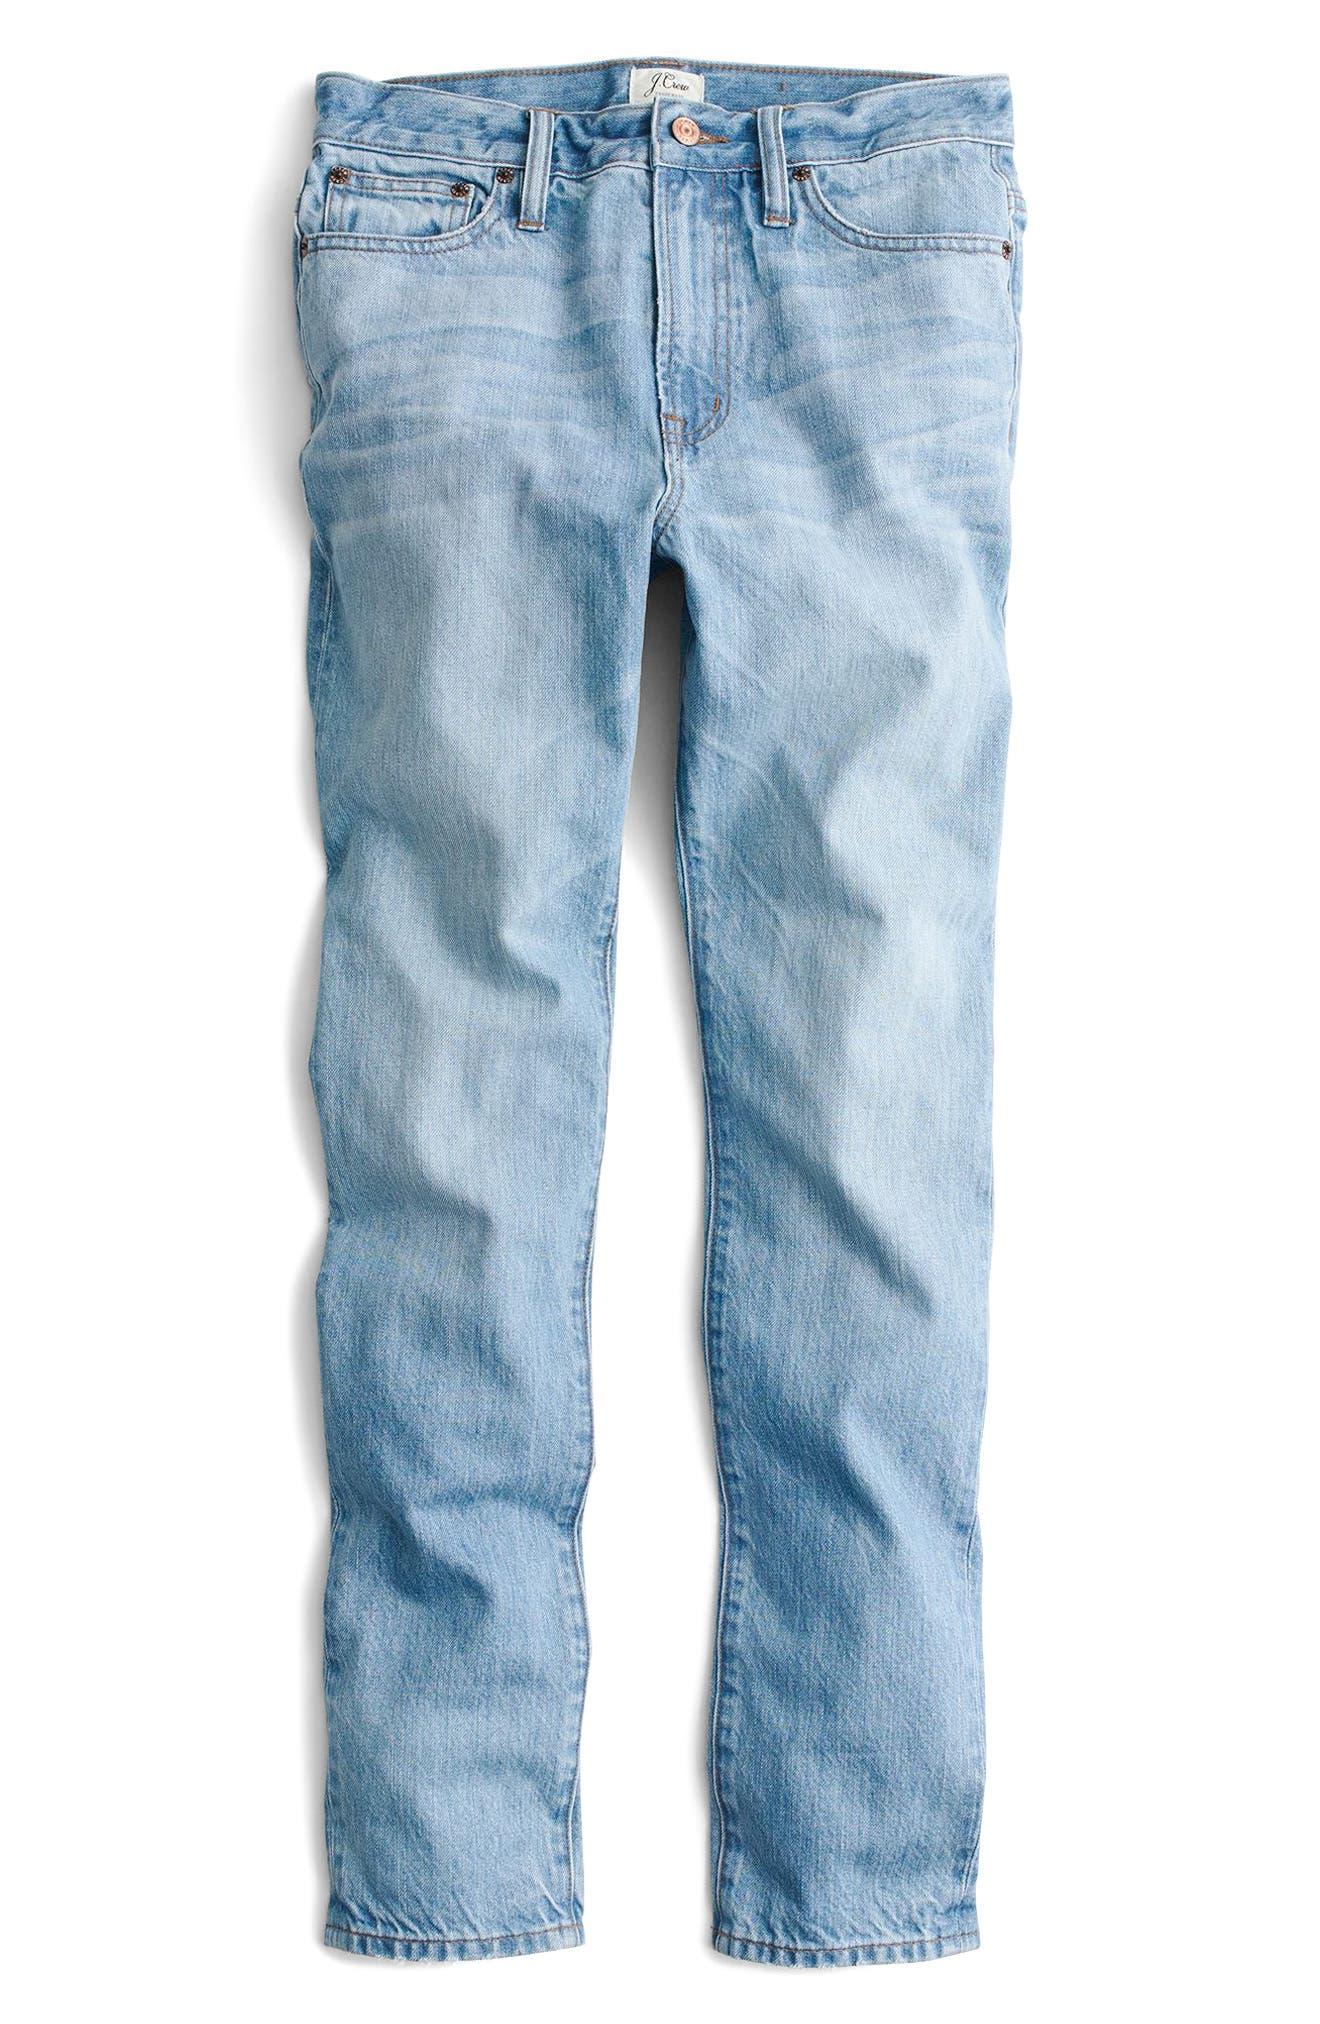 Retro Big Idea Jeans,                             Alternate thumbnail 3, color,                             Fern Wash